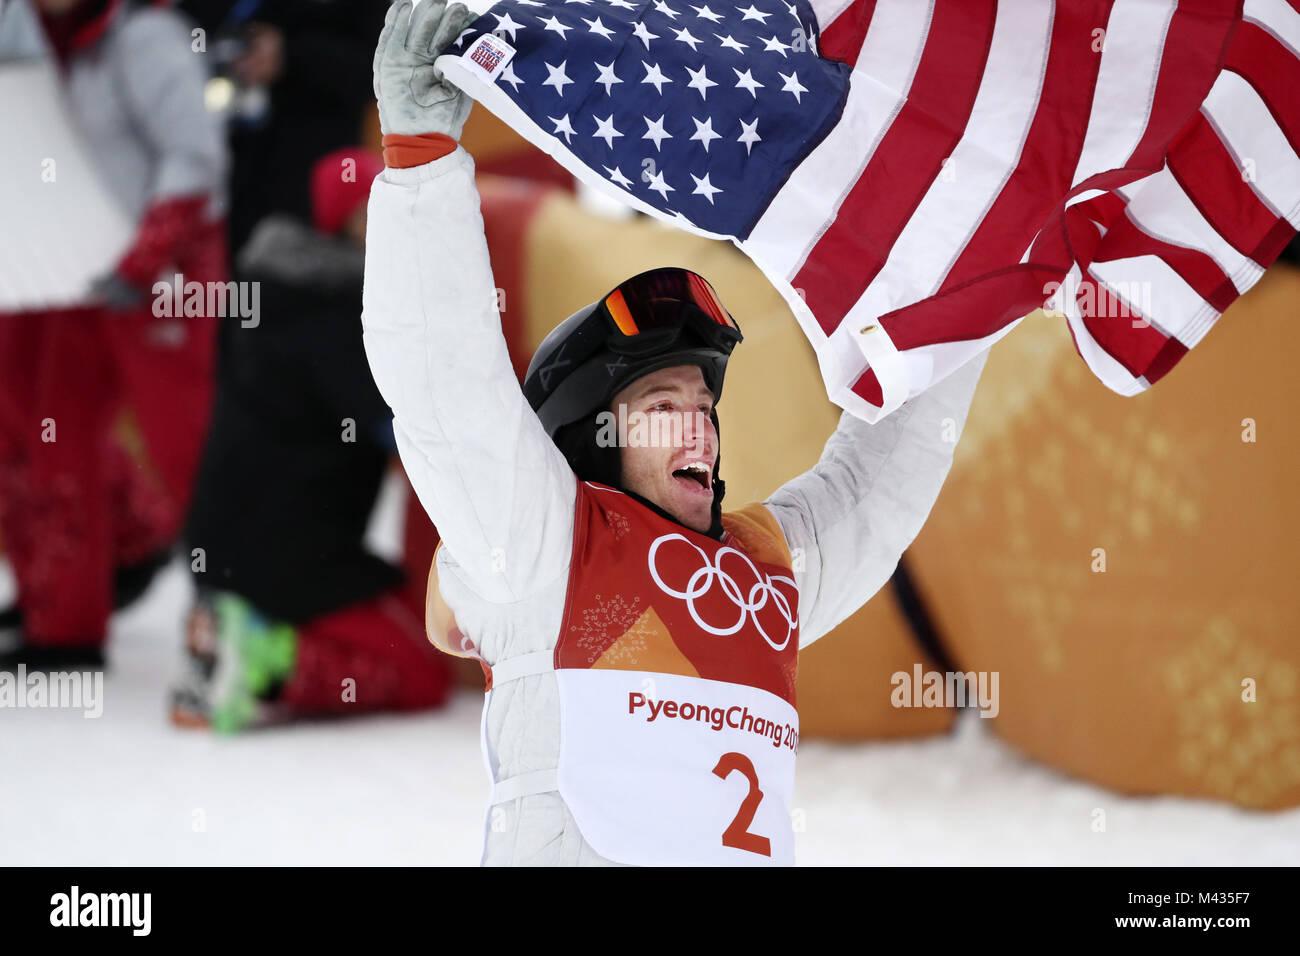 Pyeongchang, South Korea. 14th Feb, 2018. Shaun White of the U.S. celebrates after winning the men's halfpipe - Stock Image